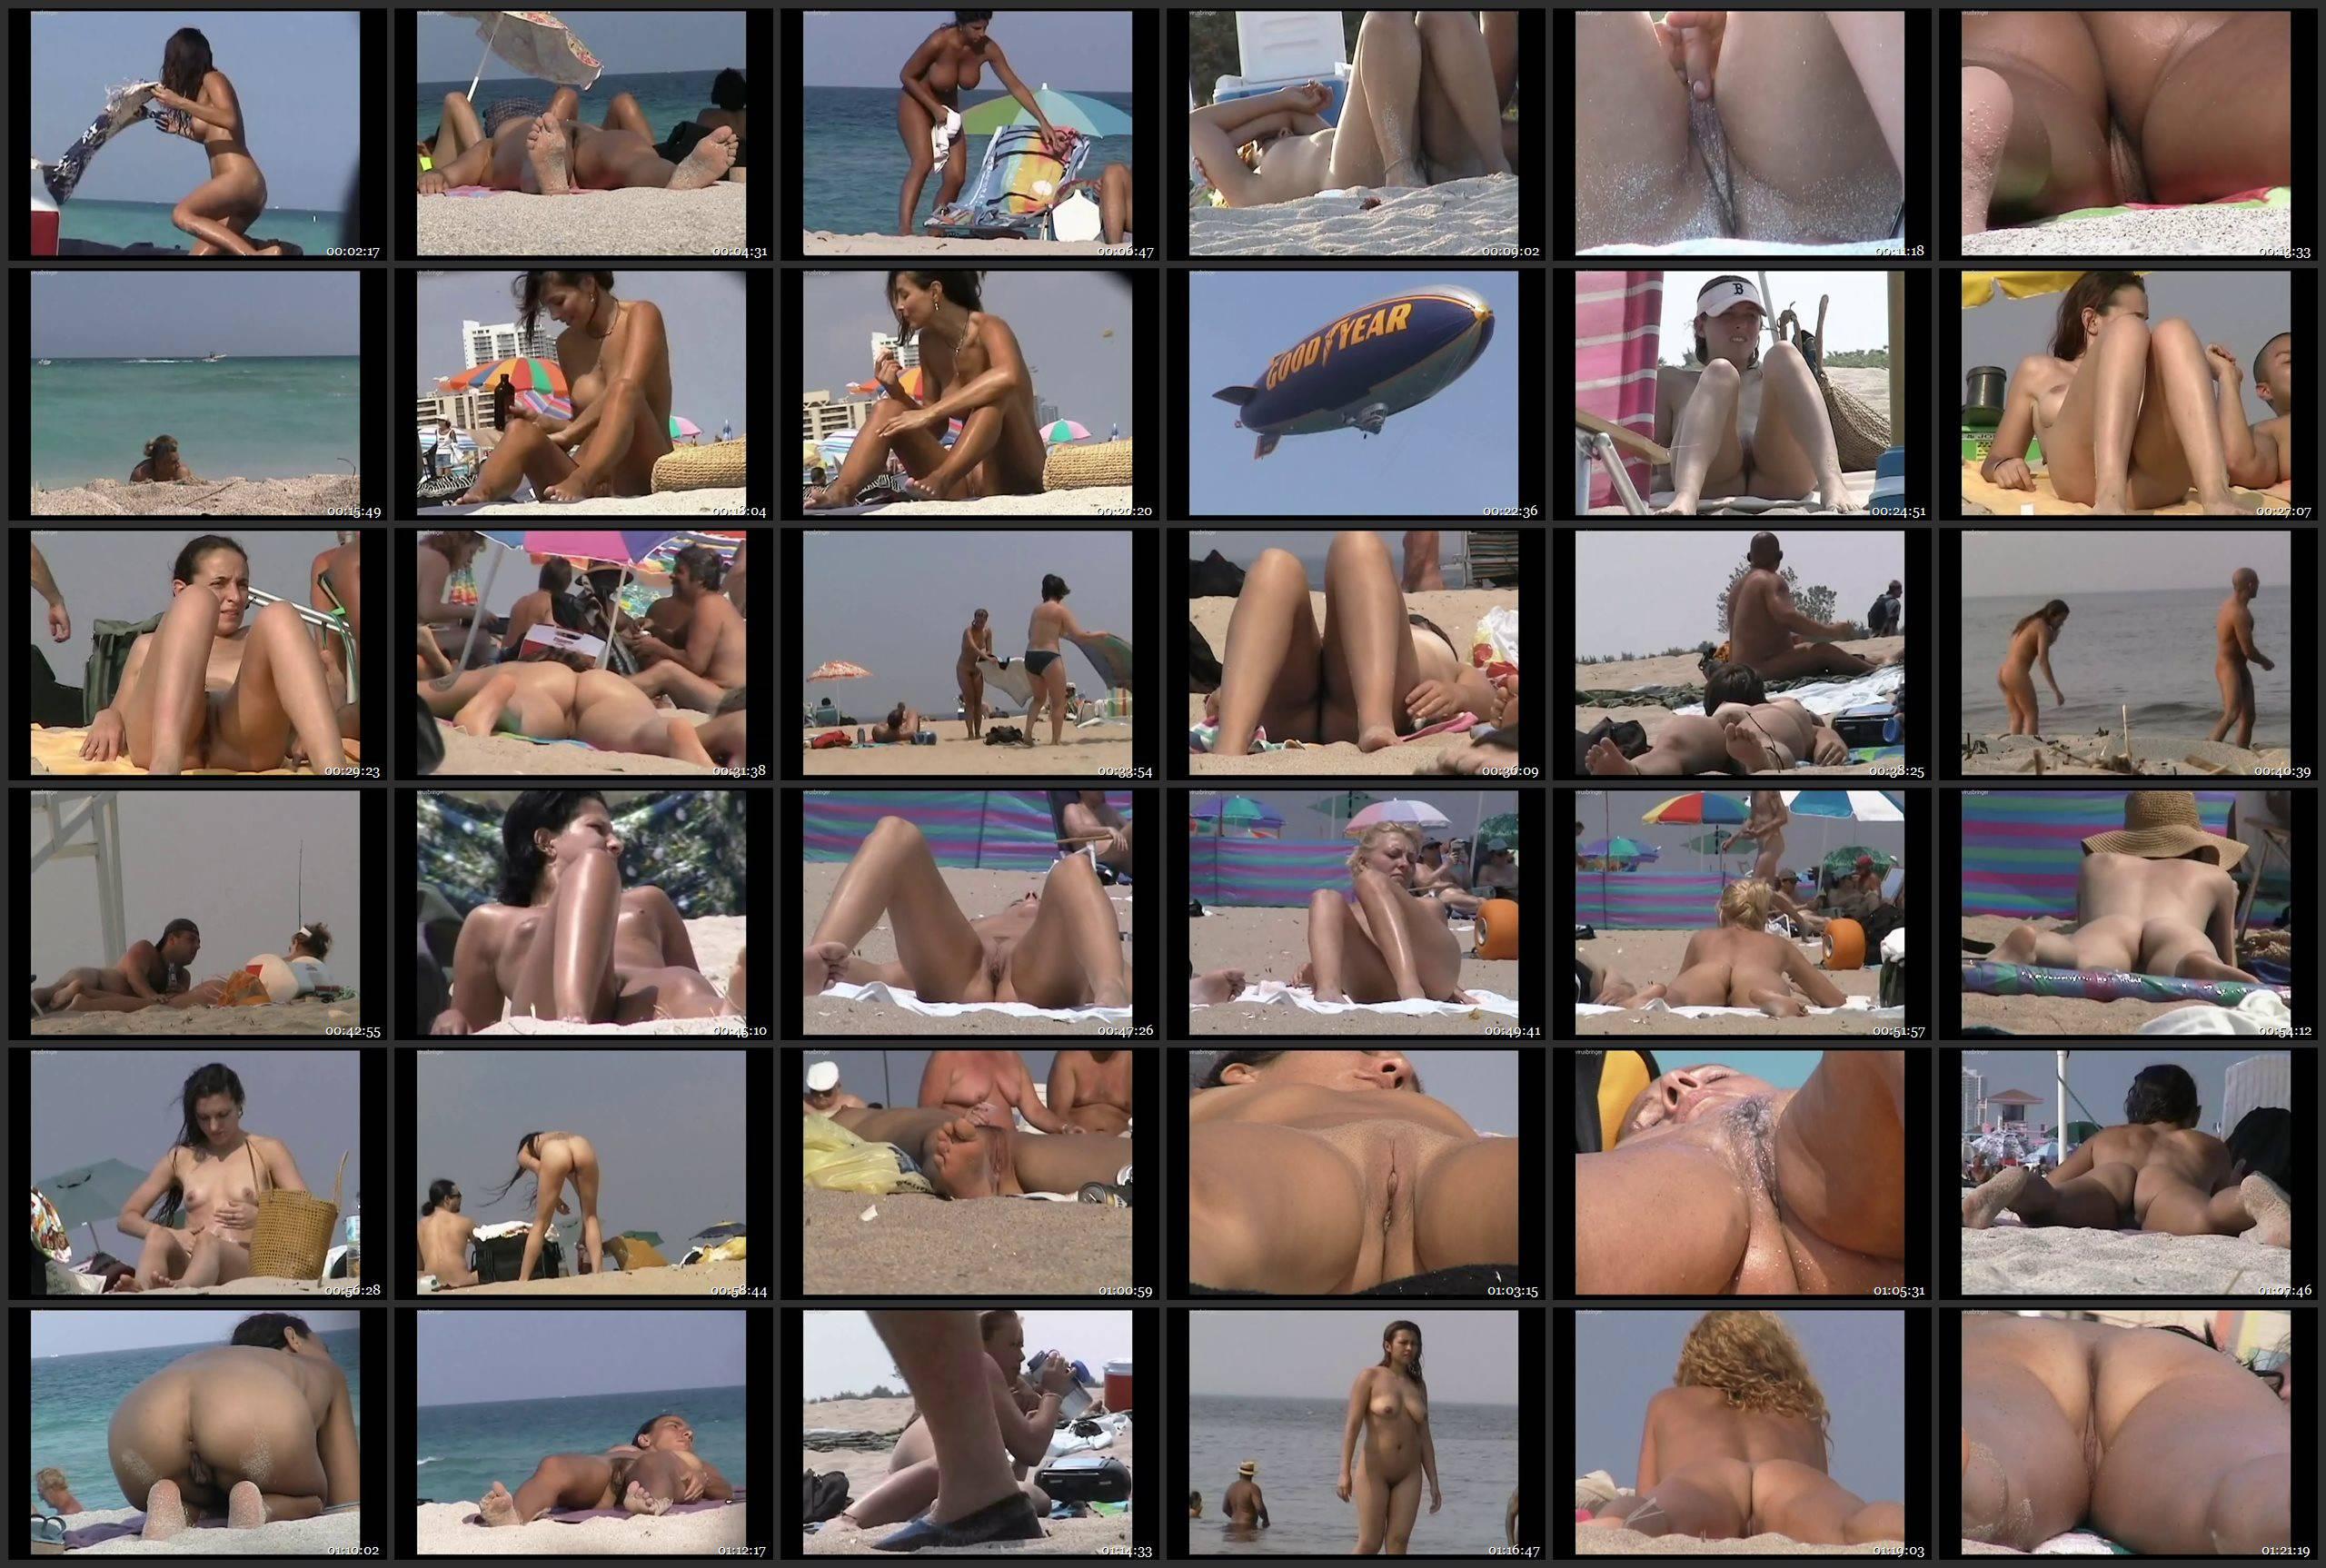 U.S. Nude Beaches Vol.7 - Thumbnails